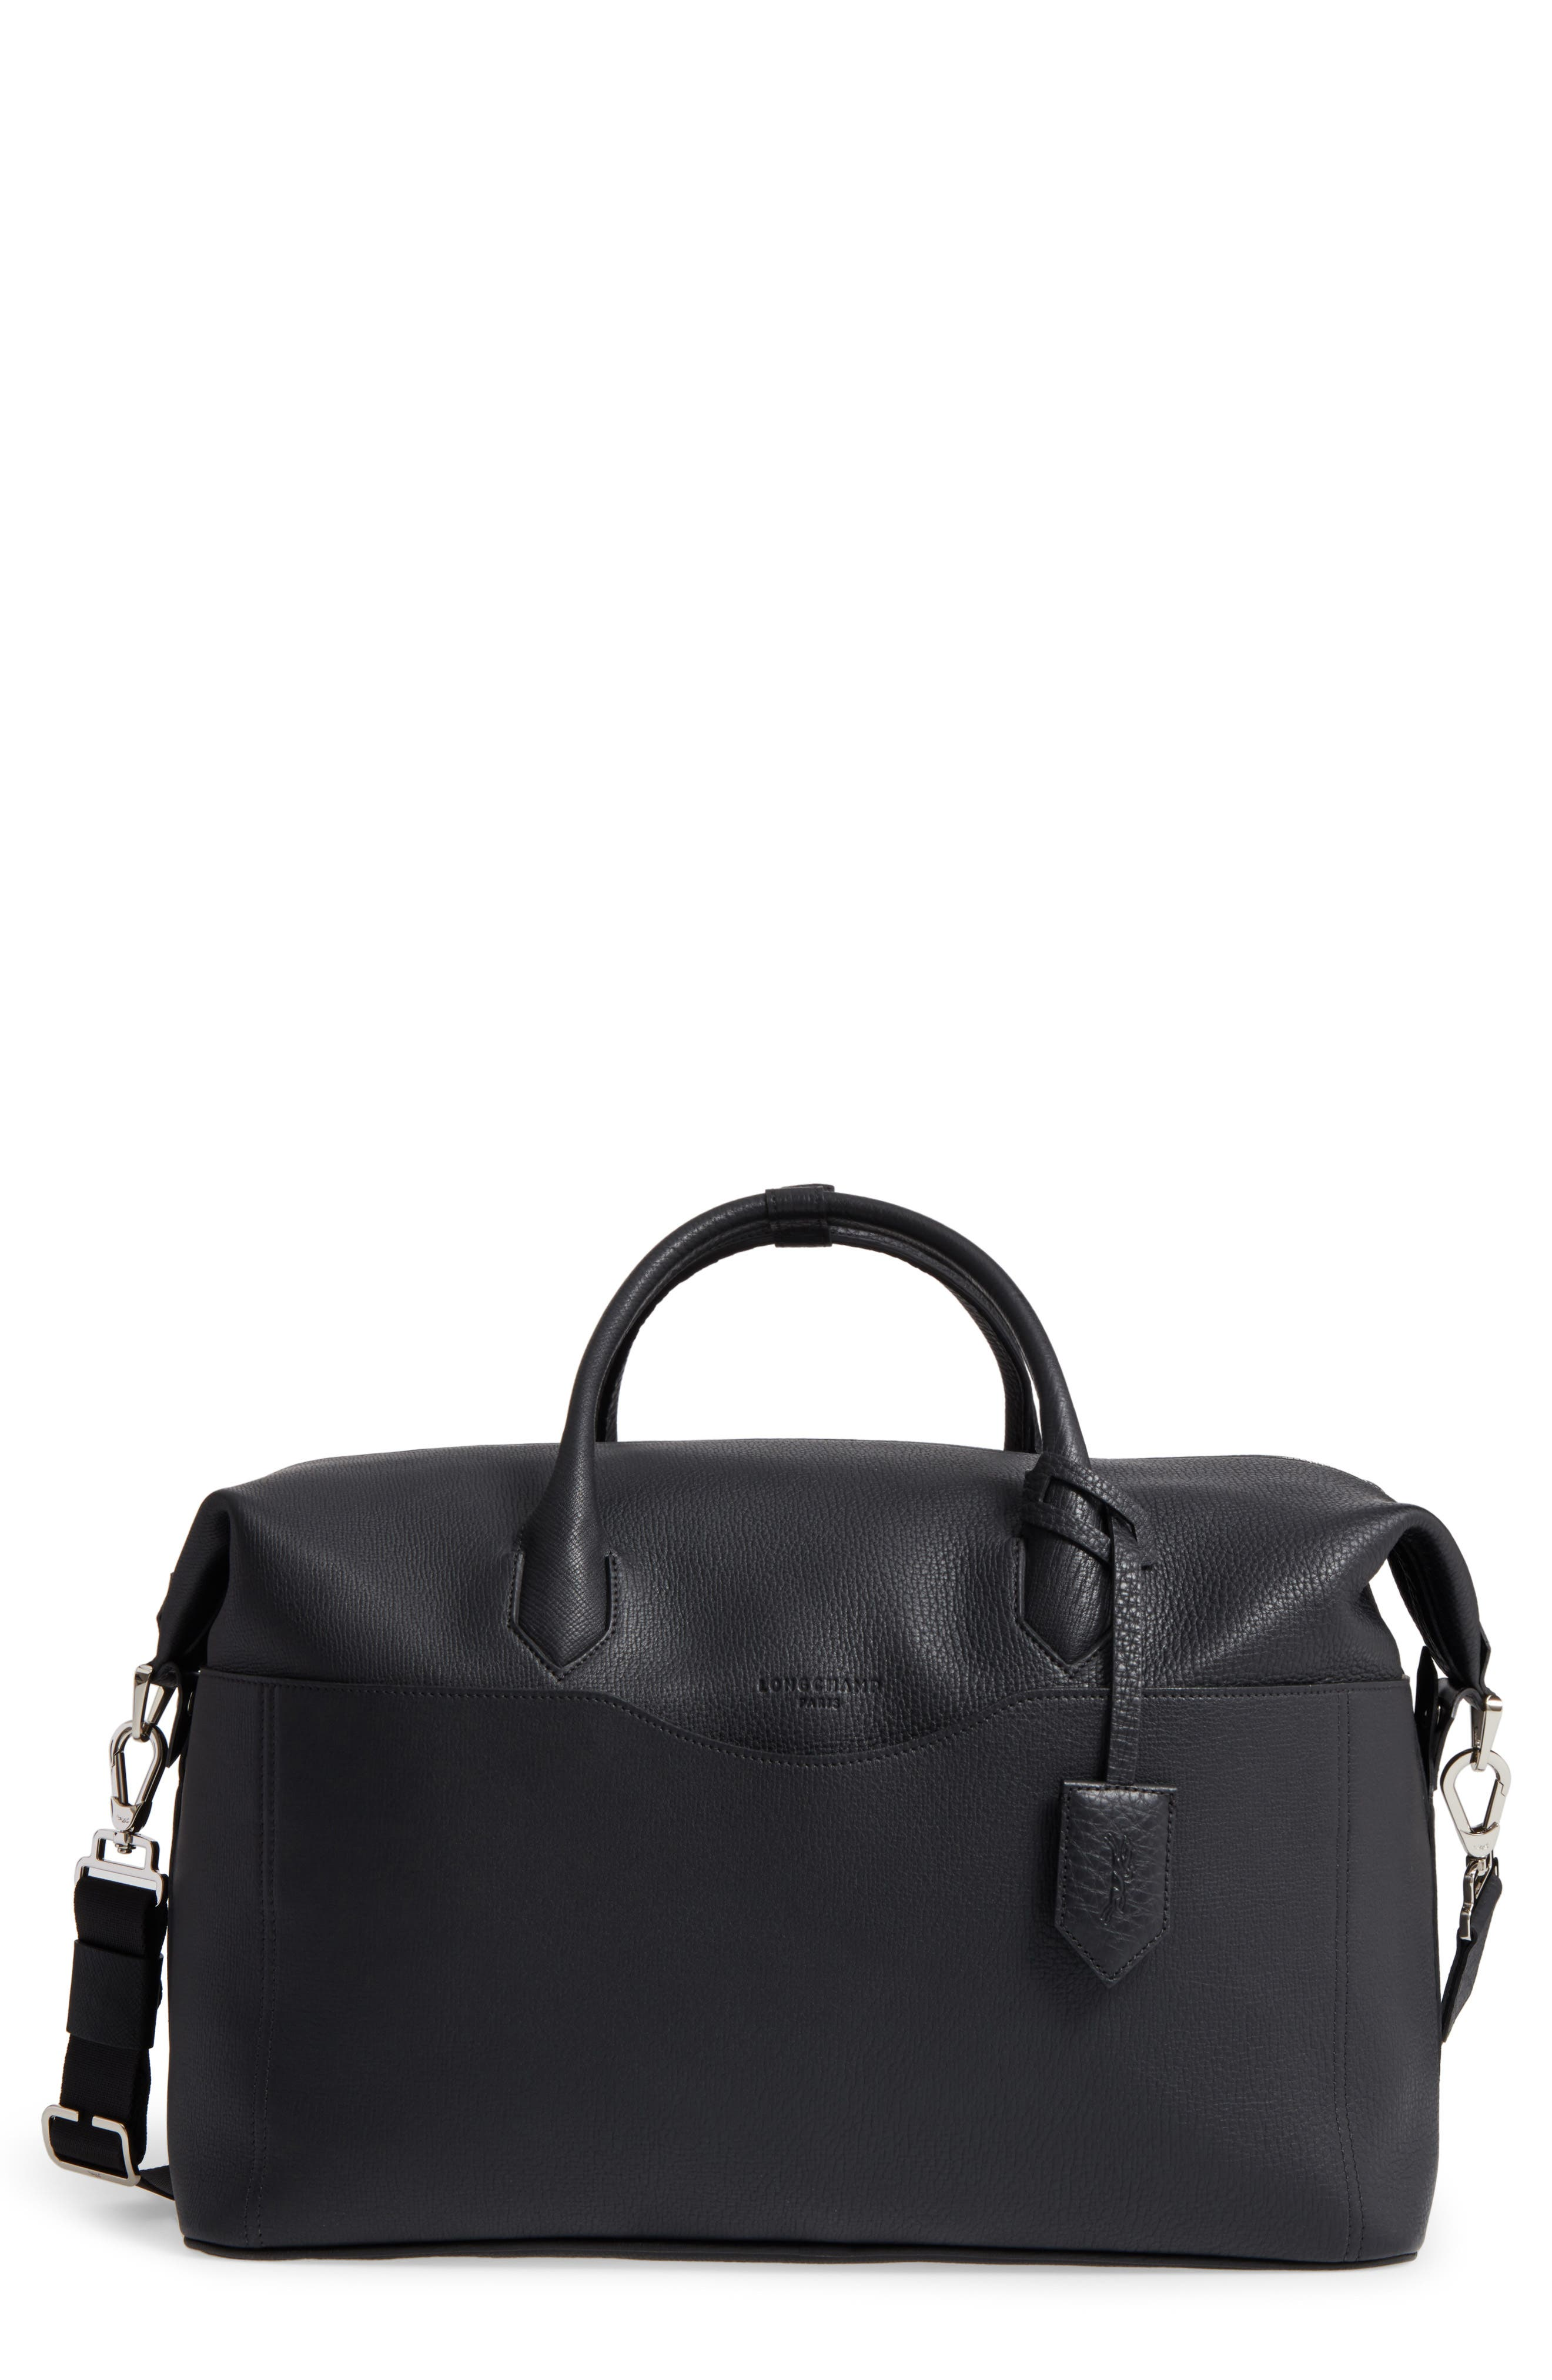 Alternate Image 1 Selected - Longchamp Ulysse Leather Travel Bag